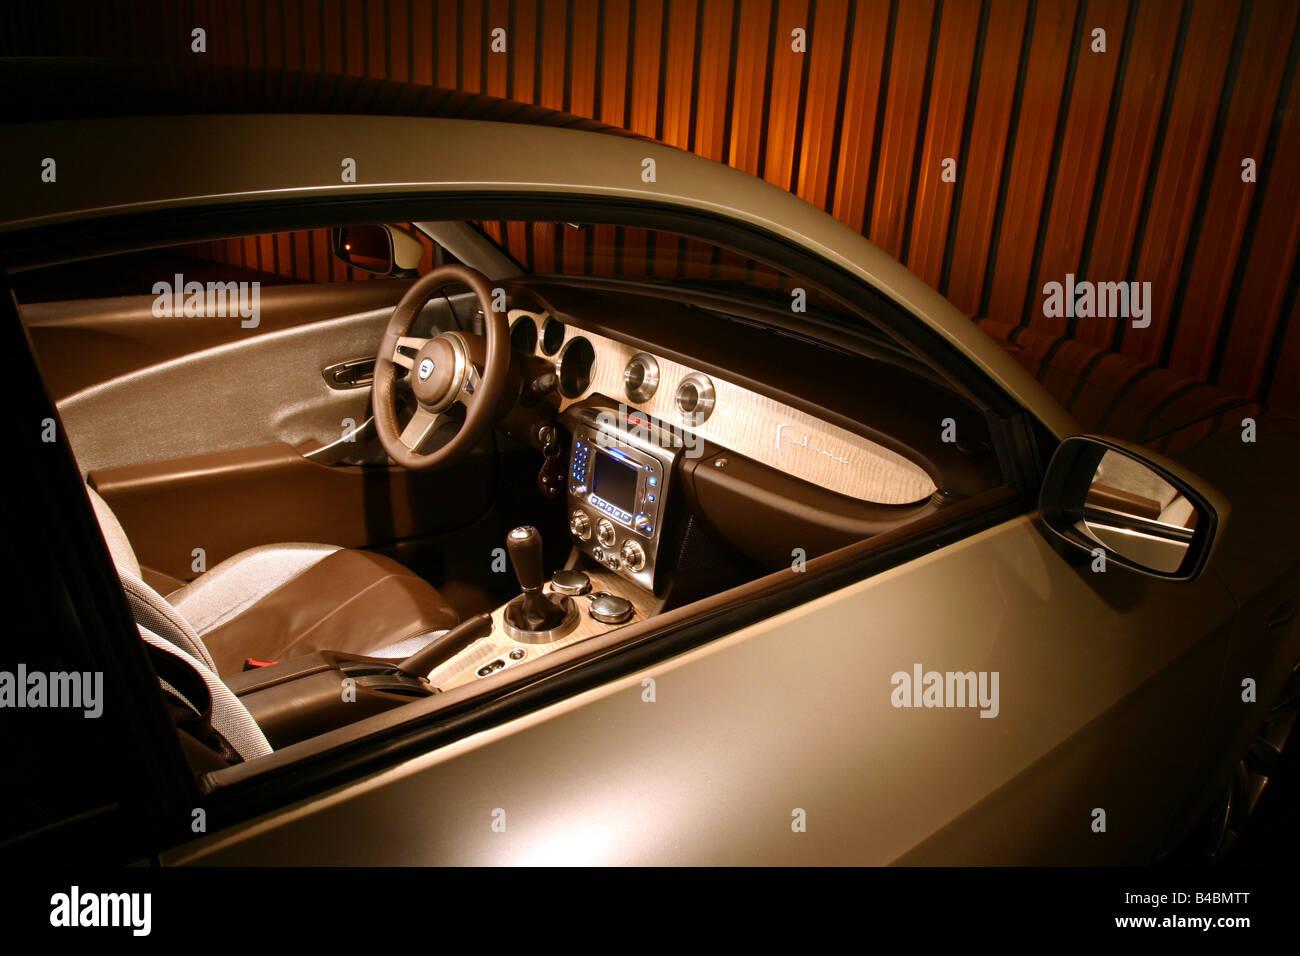 https://c8.alamy.com/comp/B4BMTT/car-lancia-fulvia-study-draft-and-design-study-model-year-2003-silver-B4BMTT.jpg